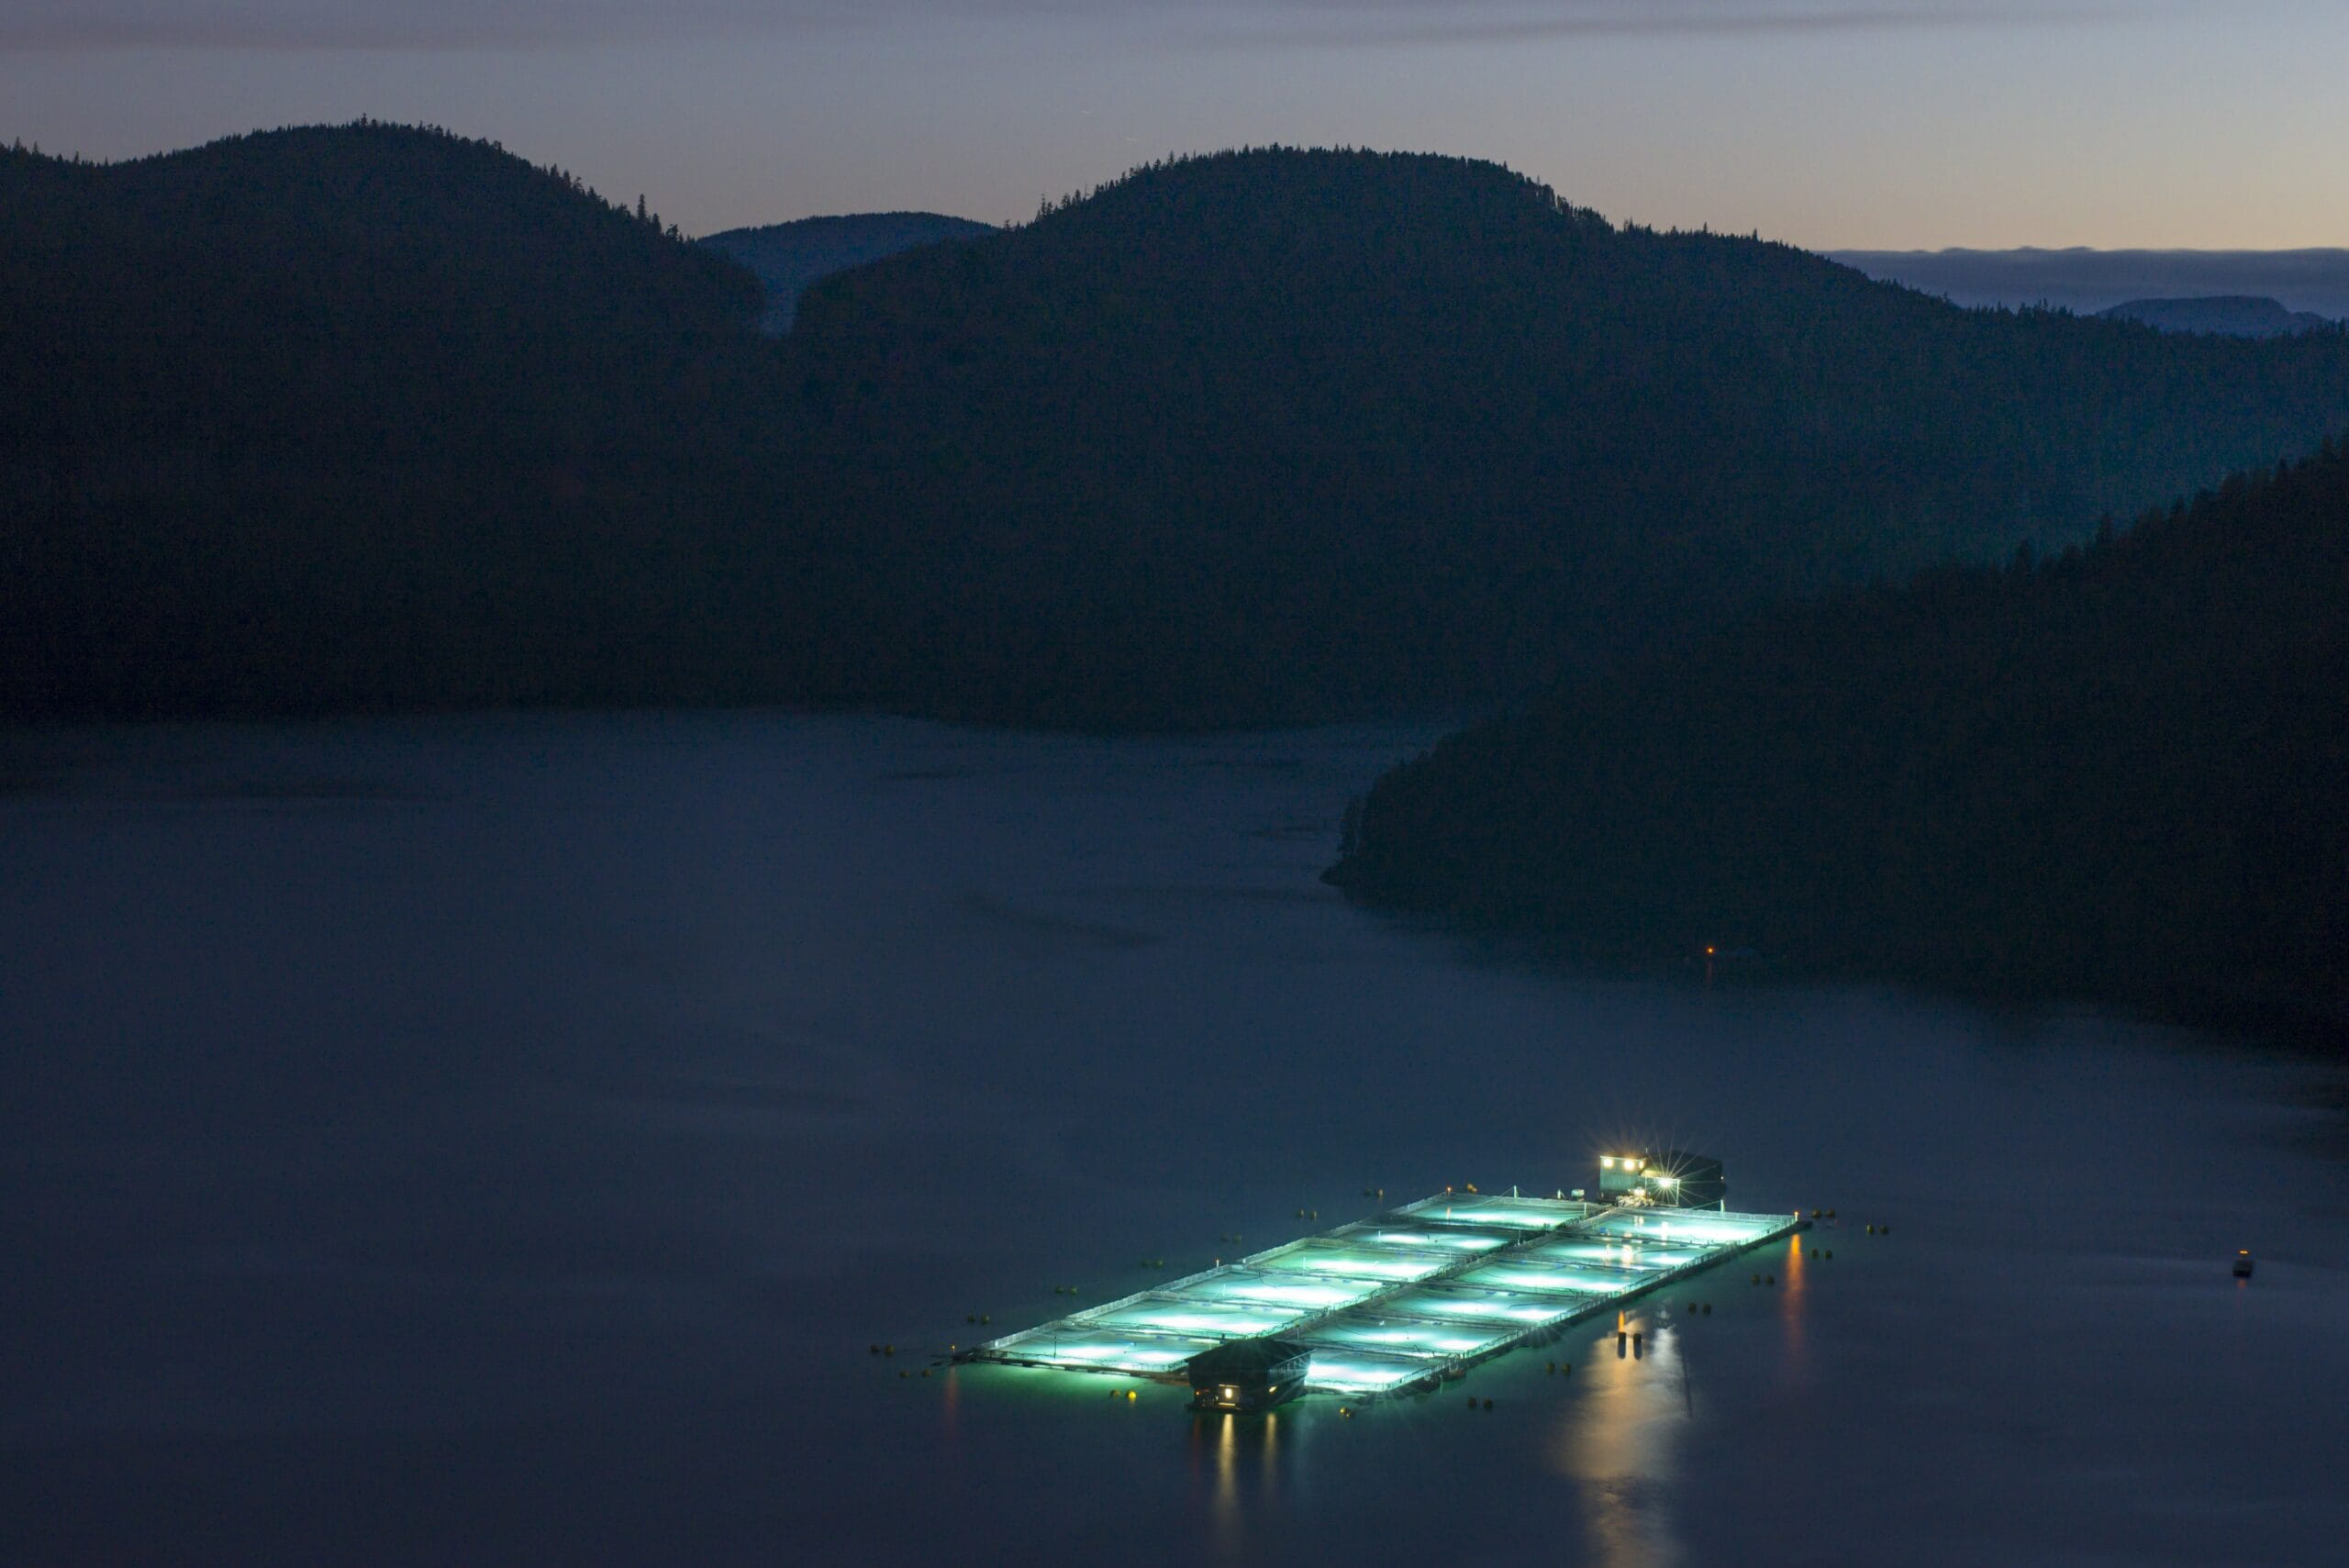 A BC fish farm seen from the air at night